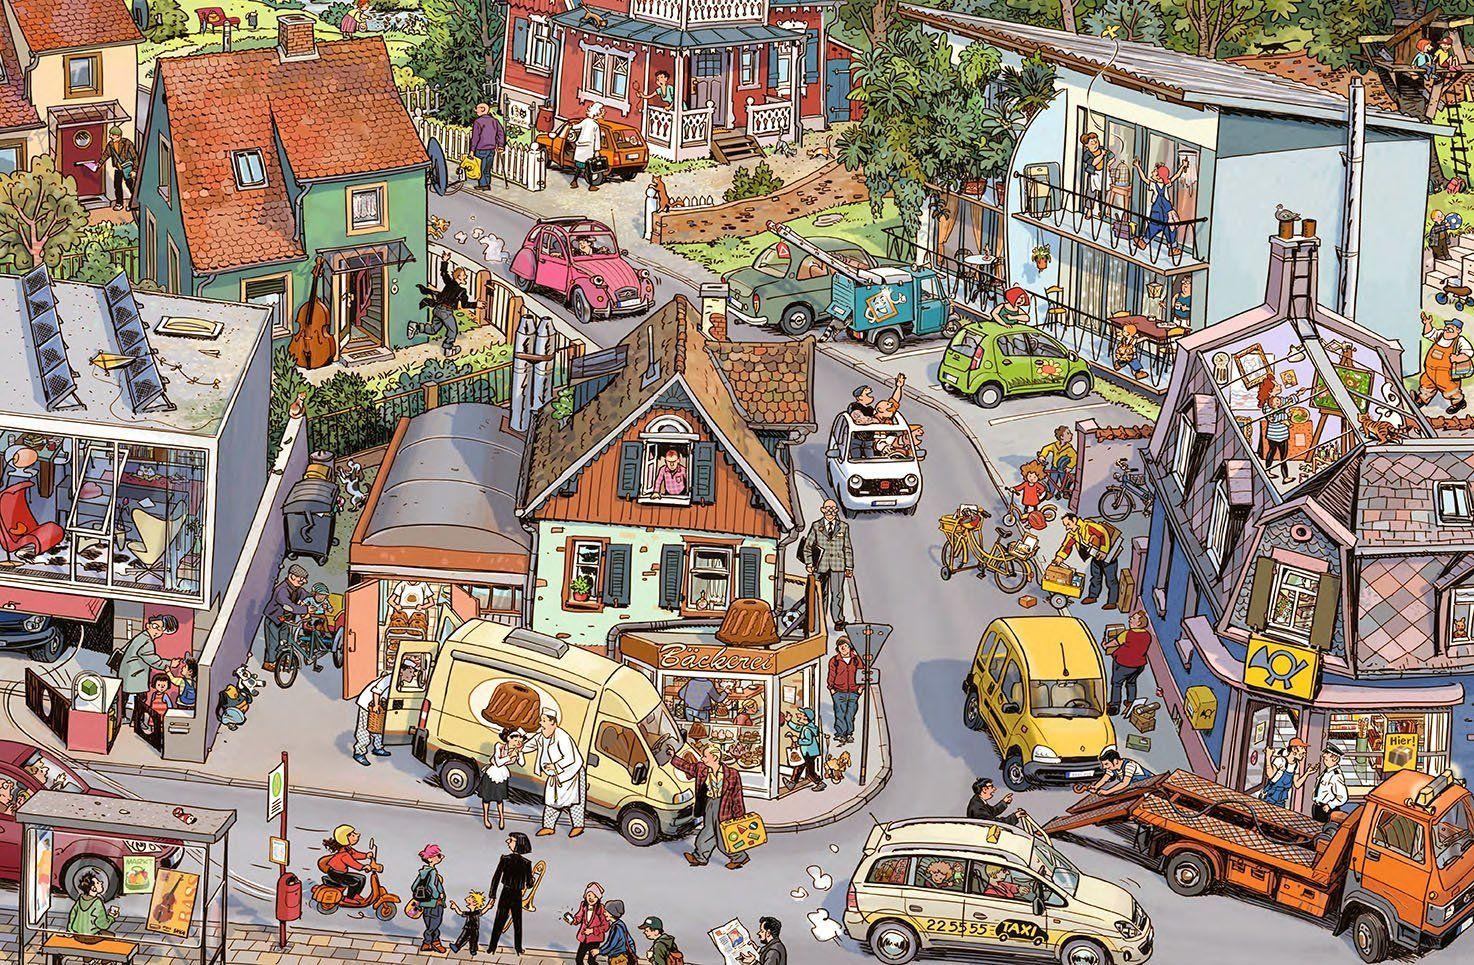 Картинка веселый городок